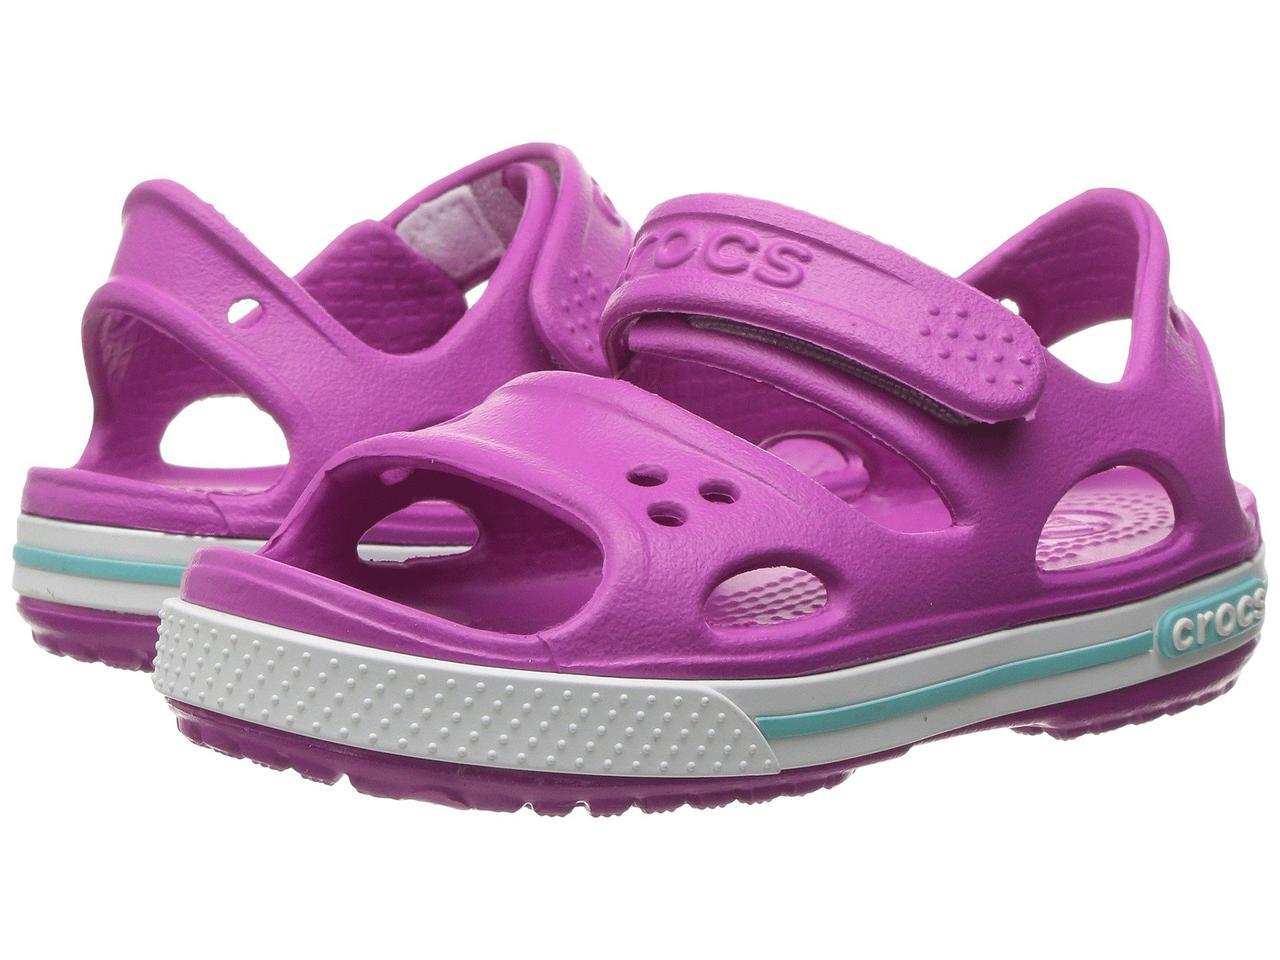 Босоножки для девочки Кроксы Крокбэнд 2 сандалии / Crocs Kids Crocband II Sandal